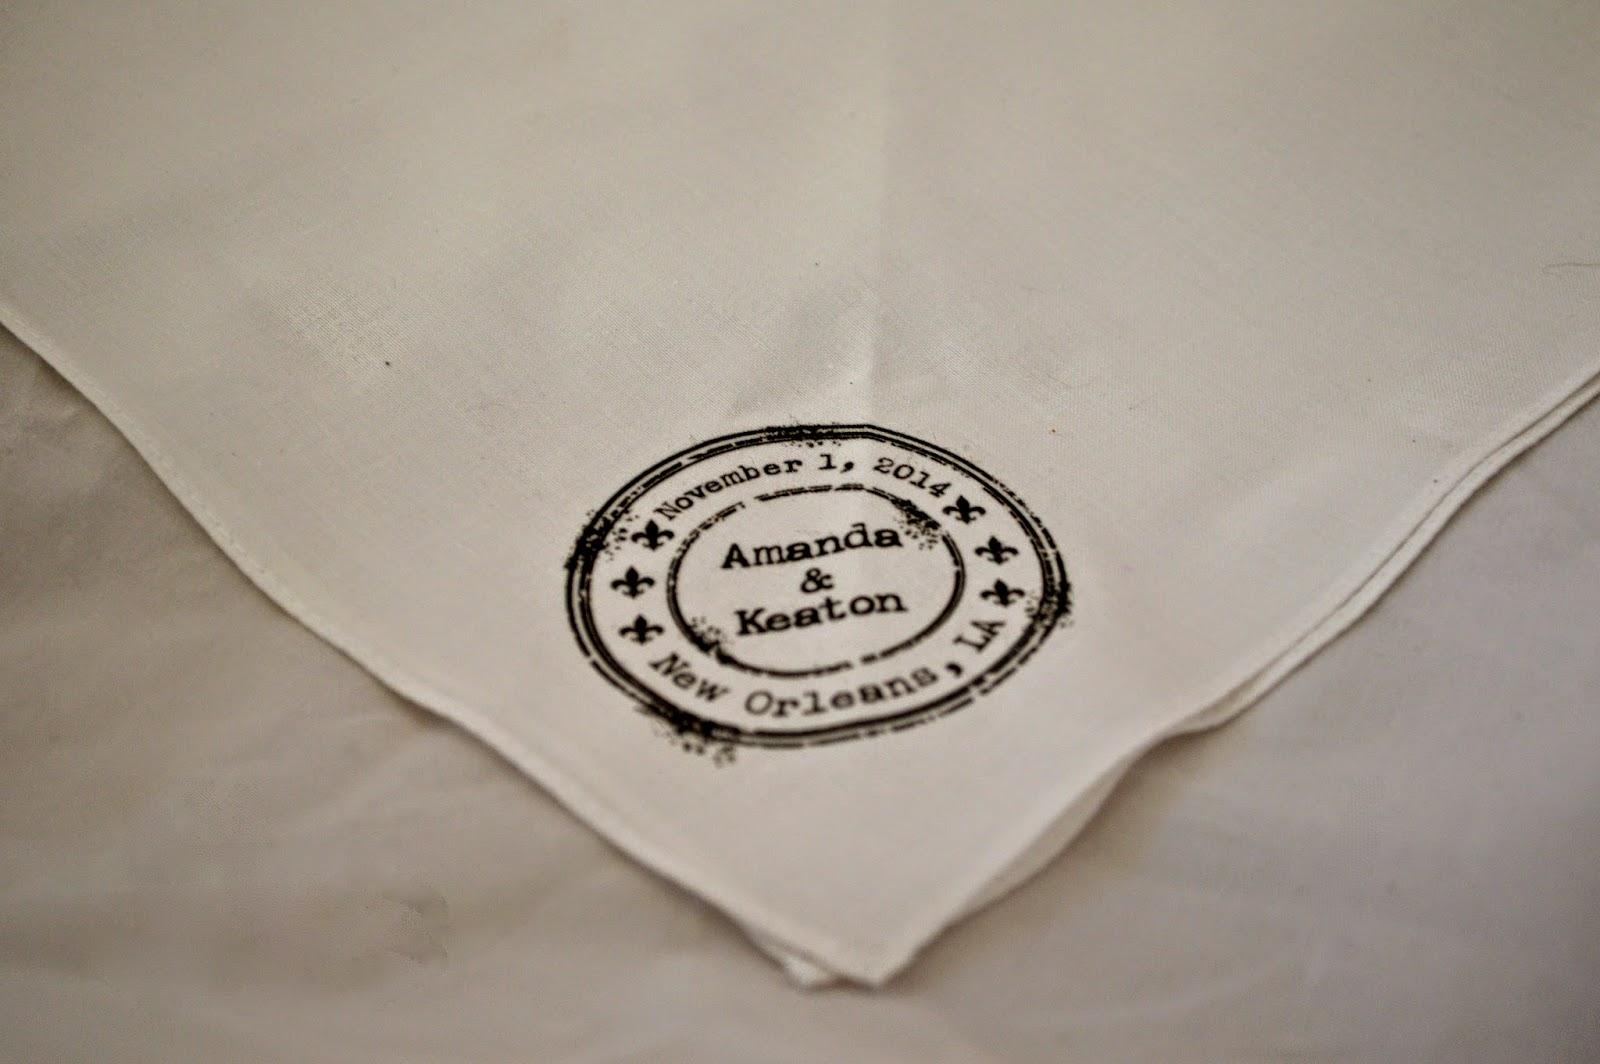 Vintage Handkerchief Wedding Invitation Diy With Print Second Line Birthday